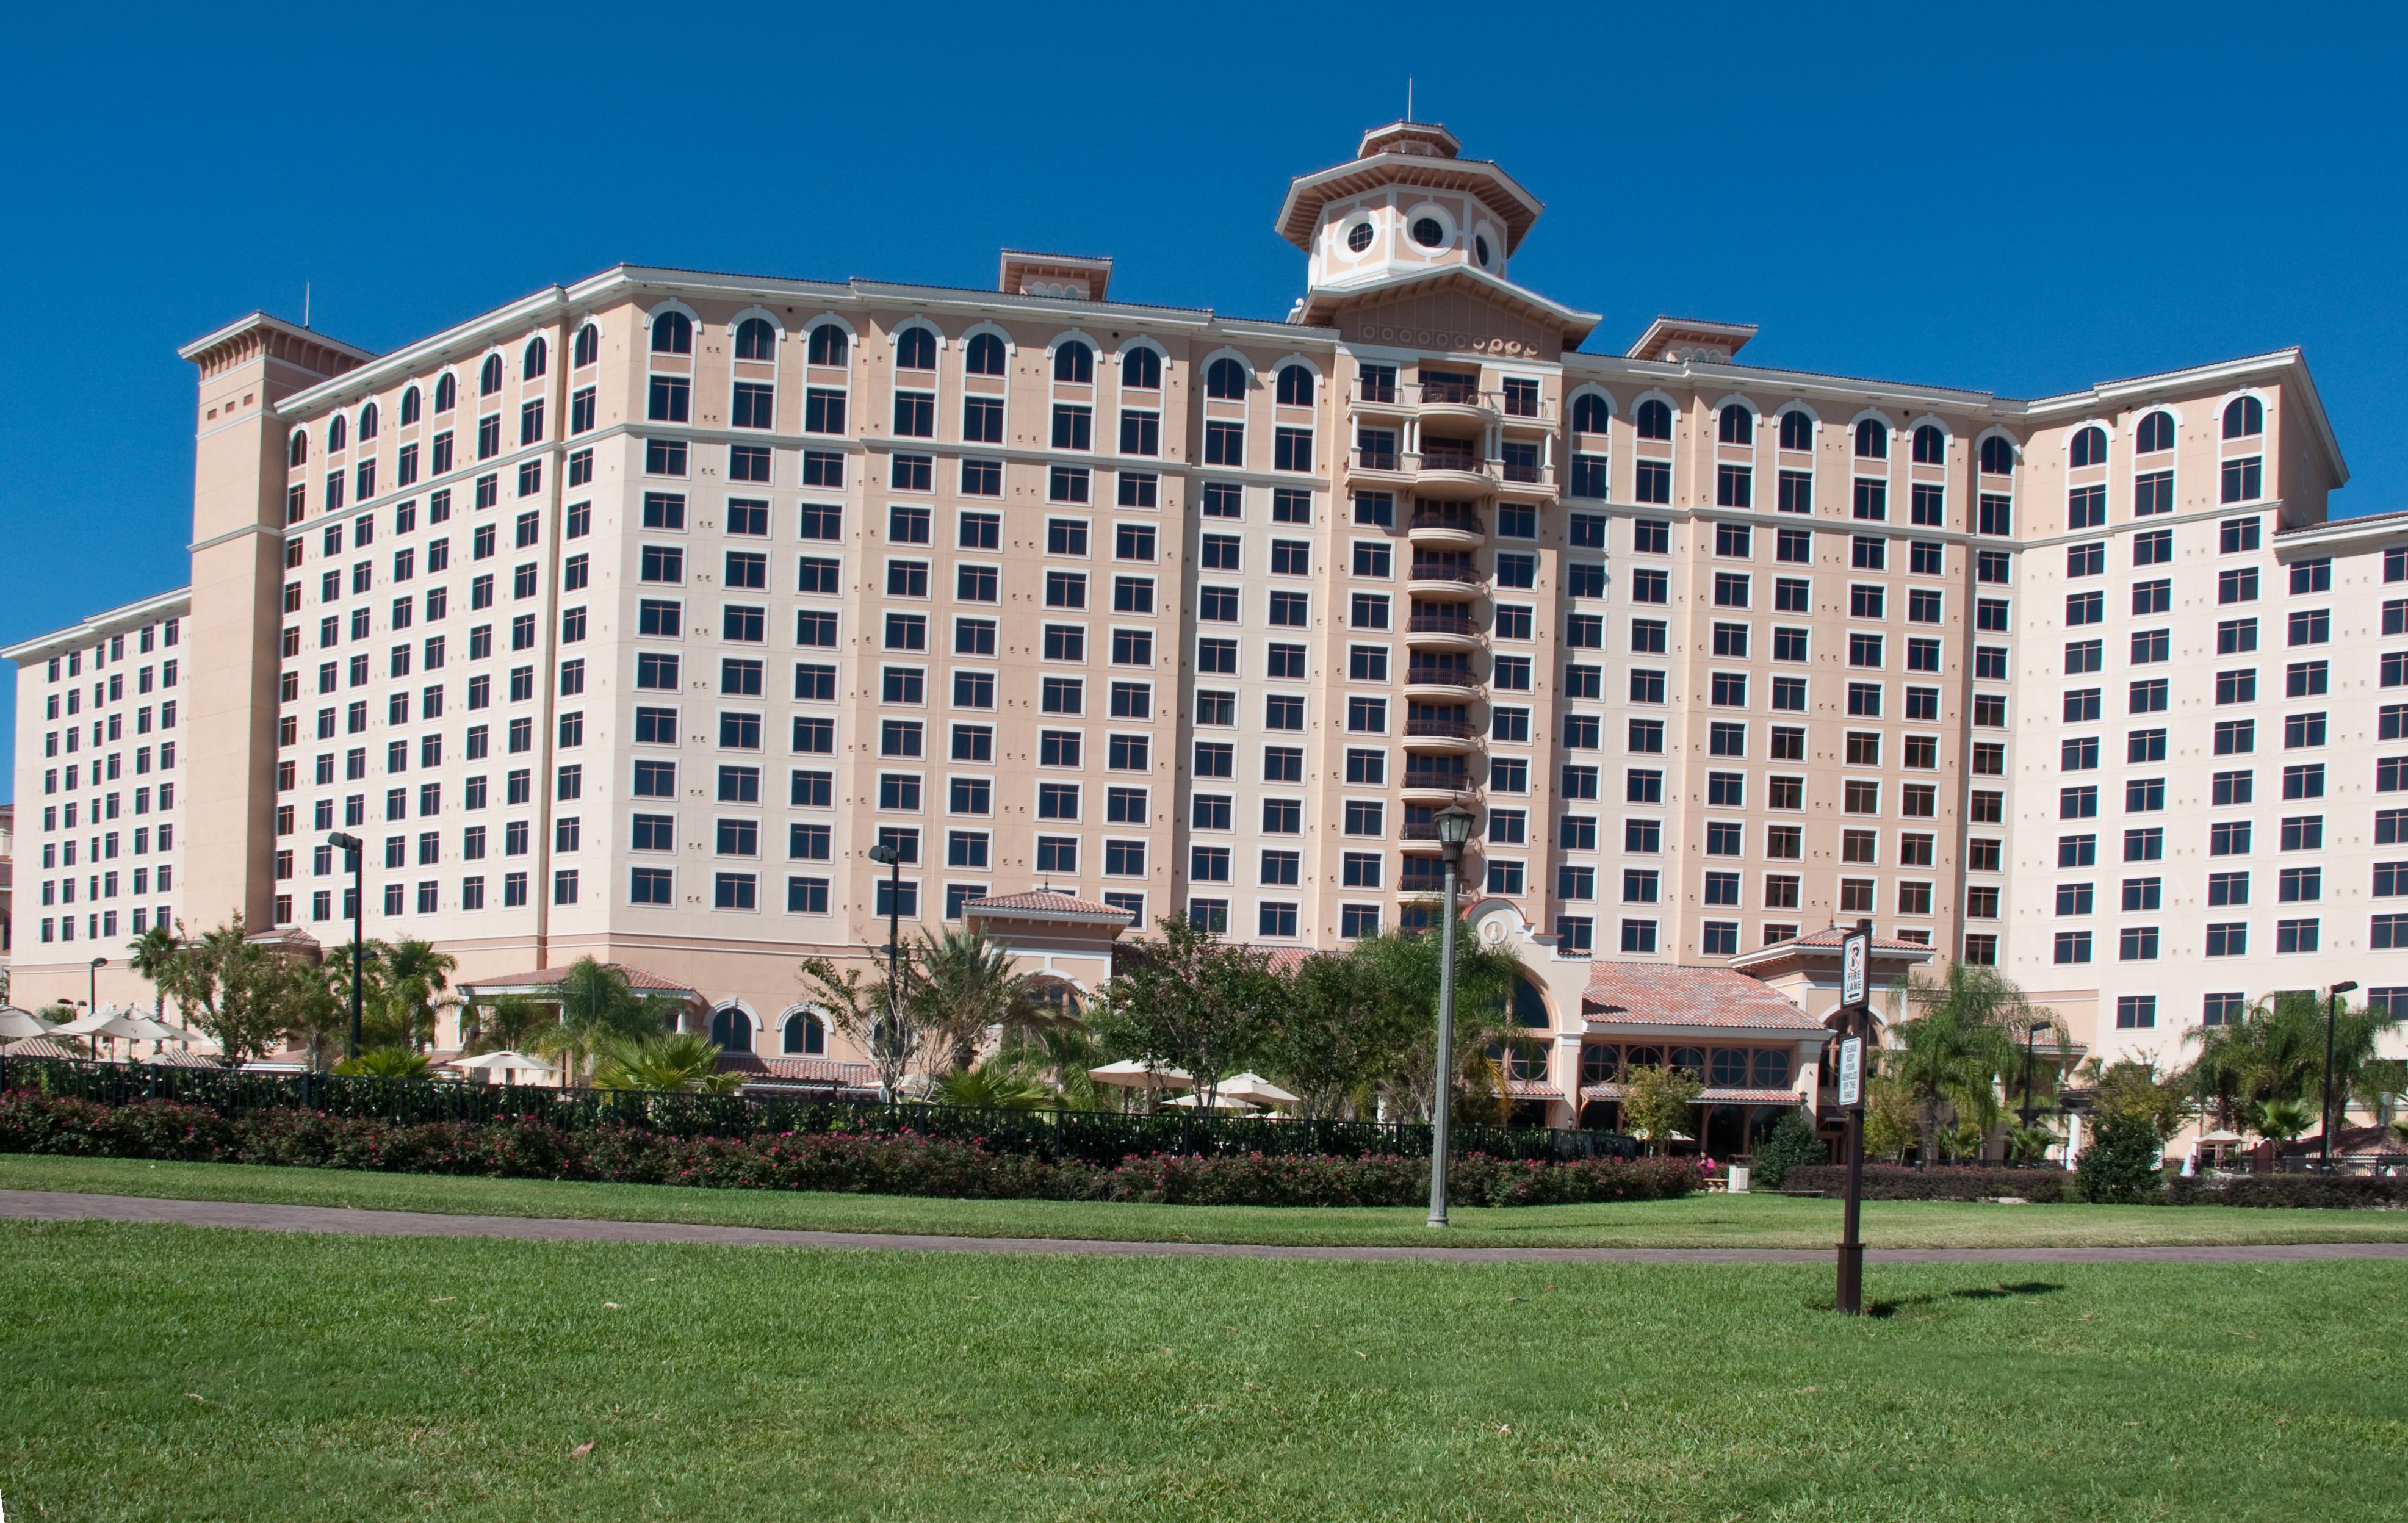 Orlando Hotels With Car Rental Desks